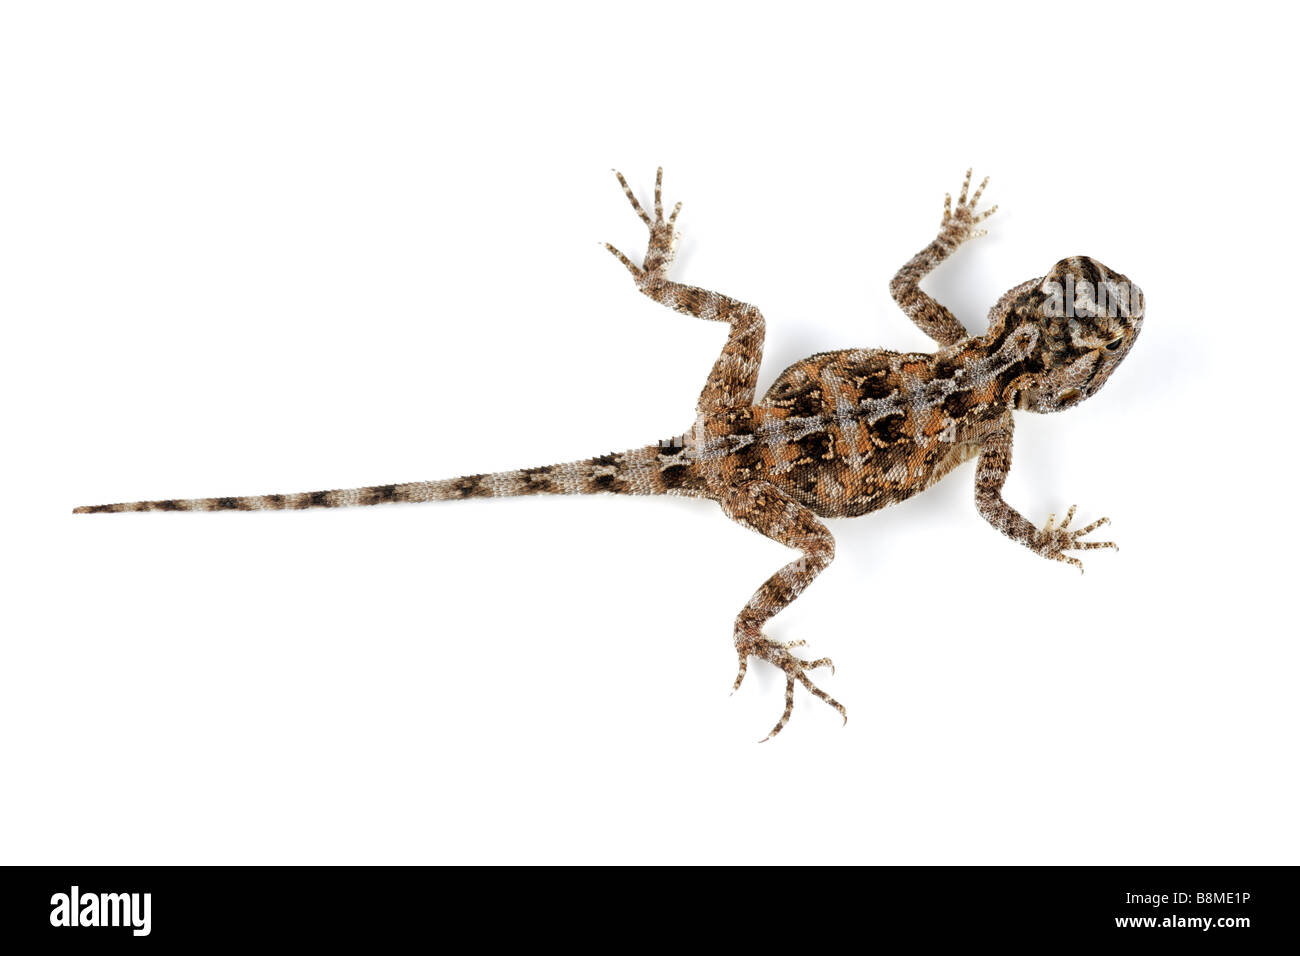 Female African ground agama (Agama aculeata) on white - Stock Image